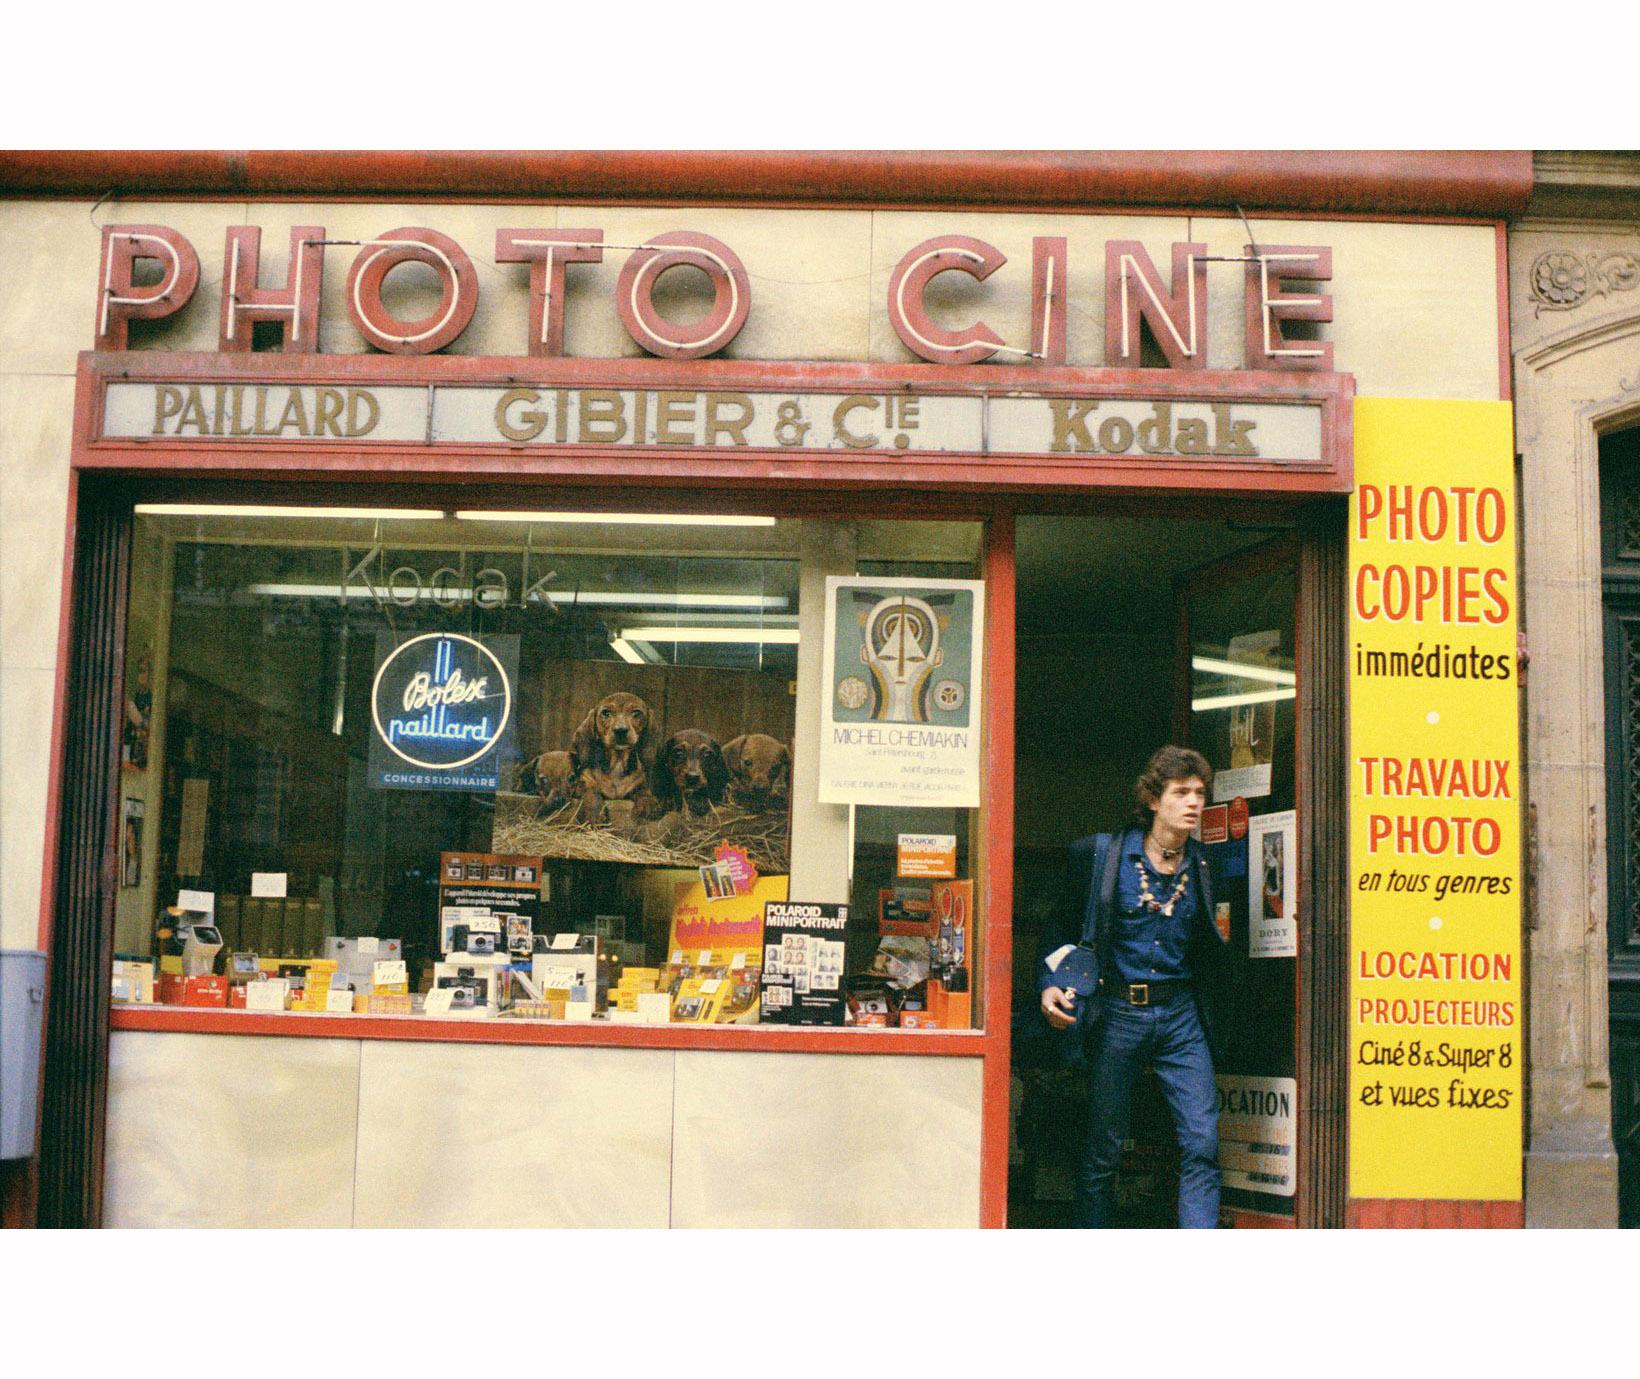 robert-mapplethorpe-on-the-boulevard-saint-germain-paris-1971-c2a9-peter-schlesinger.jpg